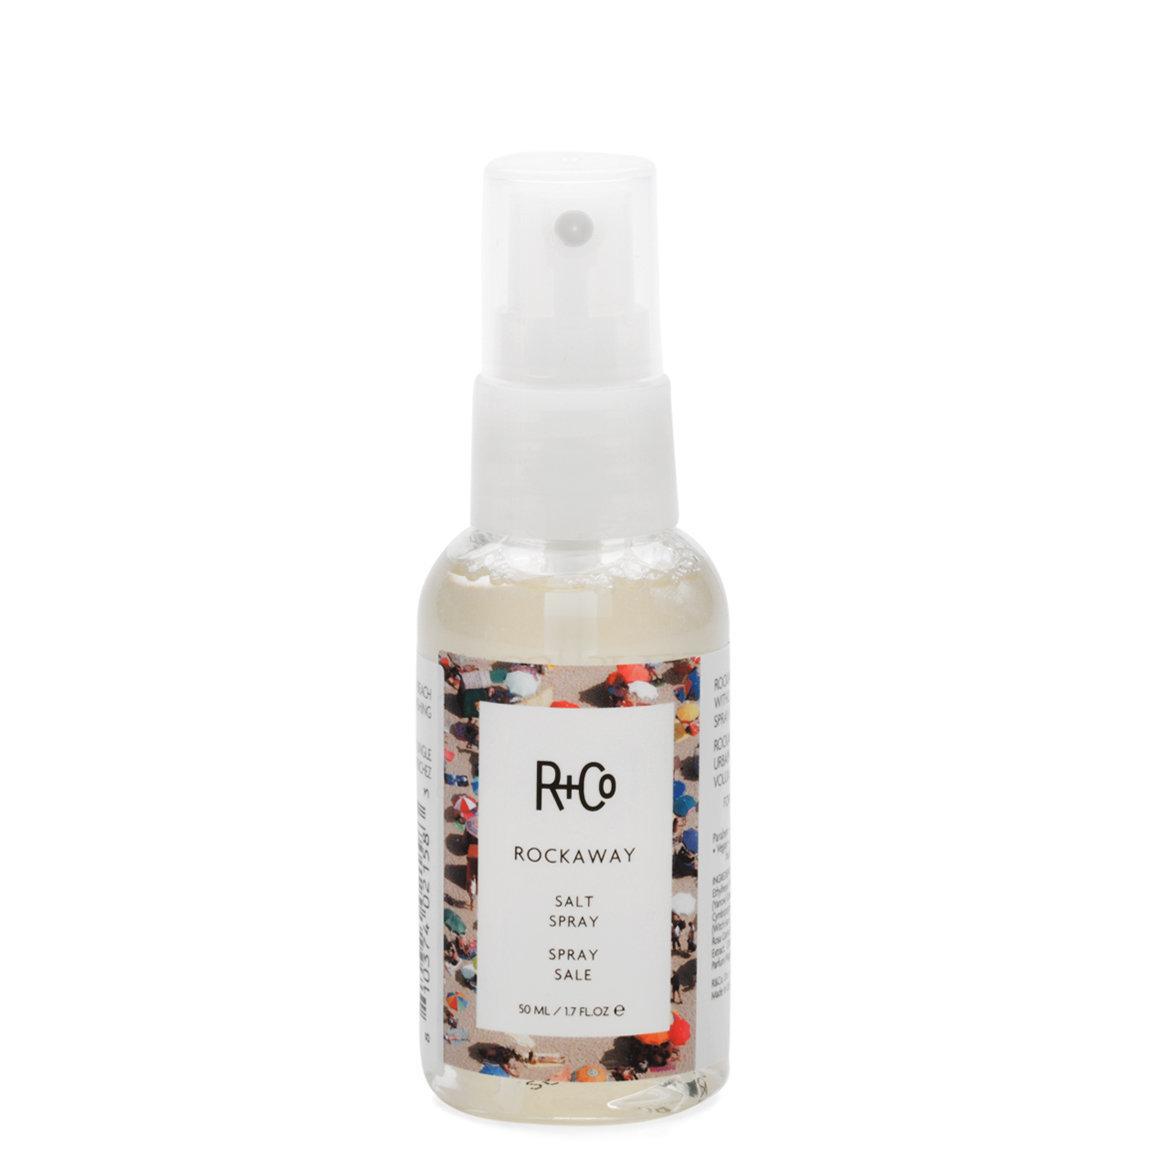 R+Co Rockaway Salt Spray  1.7 oz product swatch.